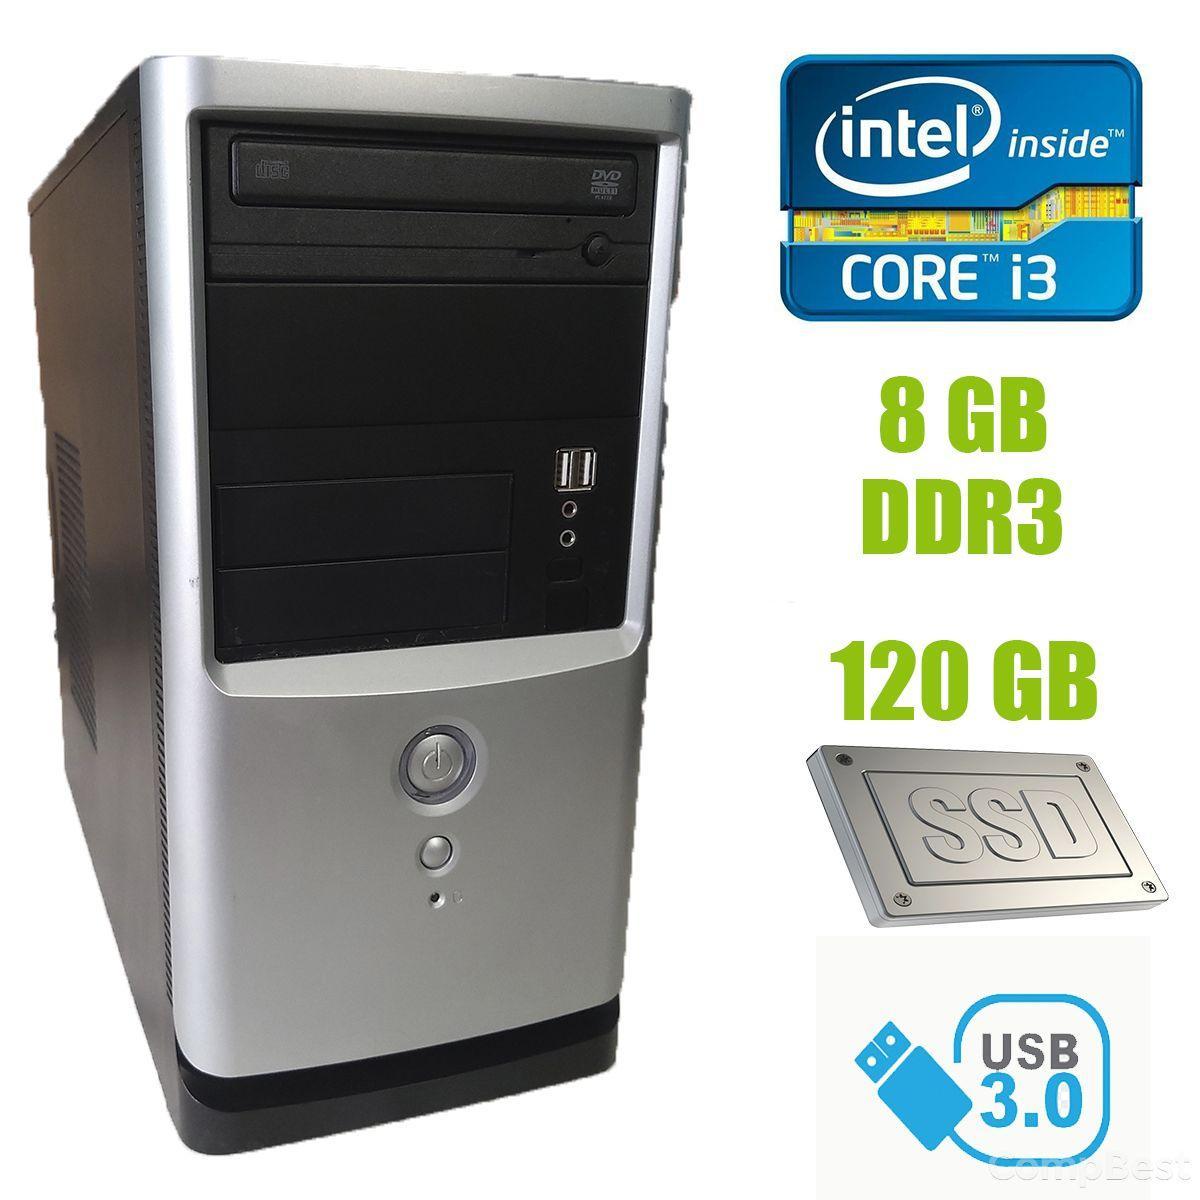 Gigabyte Tower / Intel Core i3-2120 (2 (4) ядра по 3.30 GHz) / 8 GB DDR3 / new! 240 GB SSD / 350W / USB, SATA, PCI 3.0